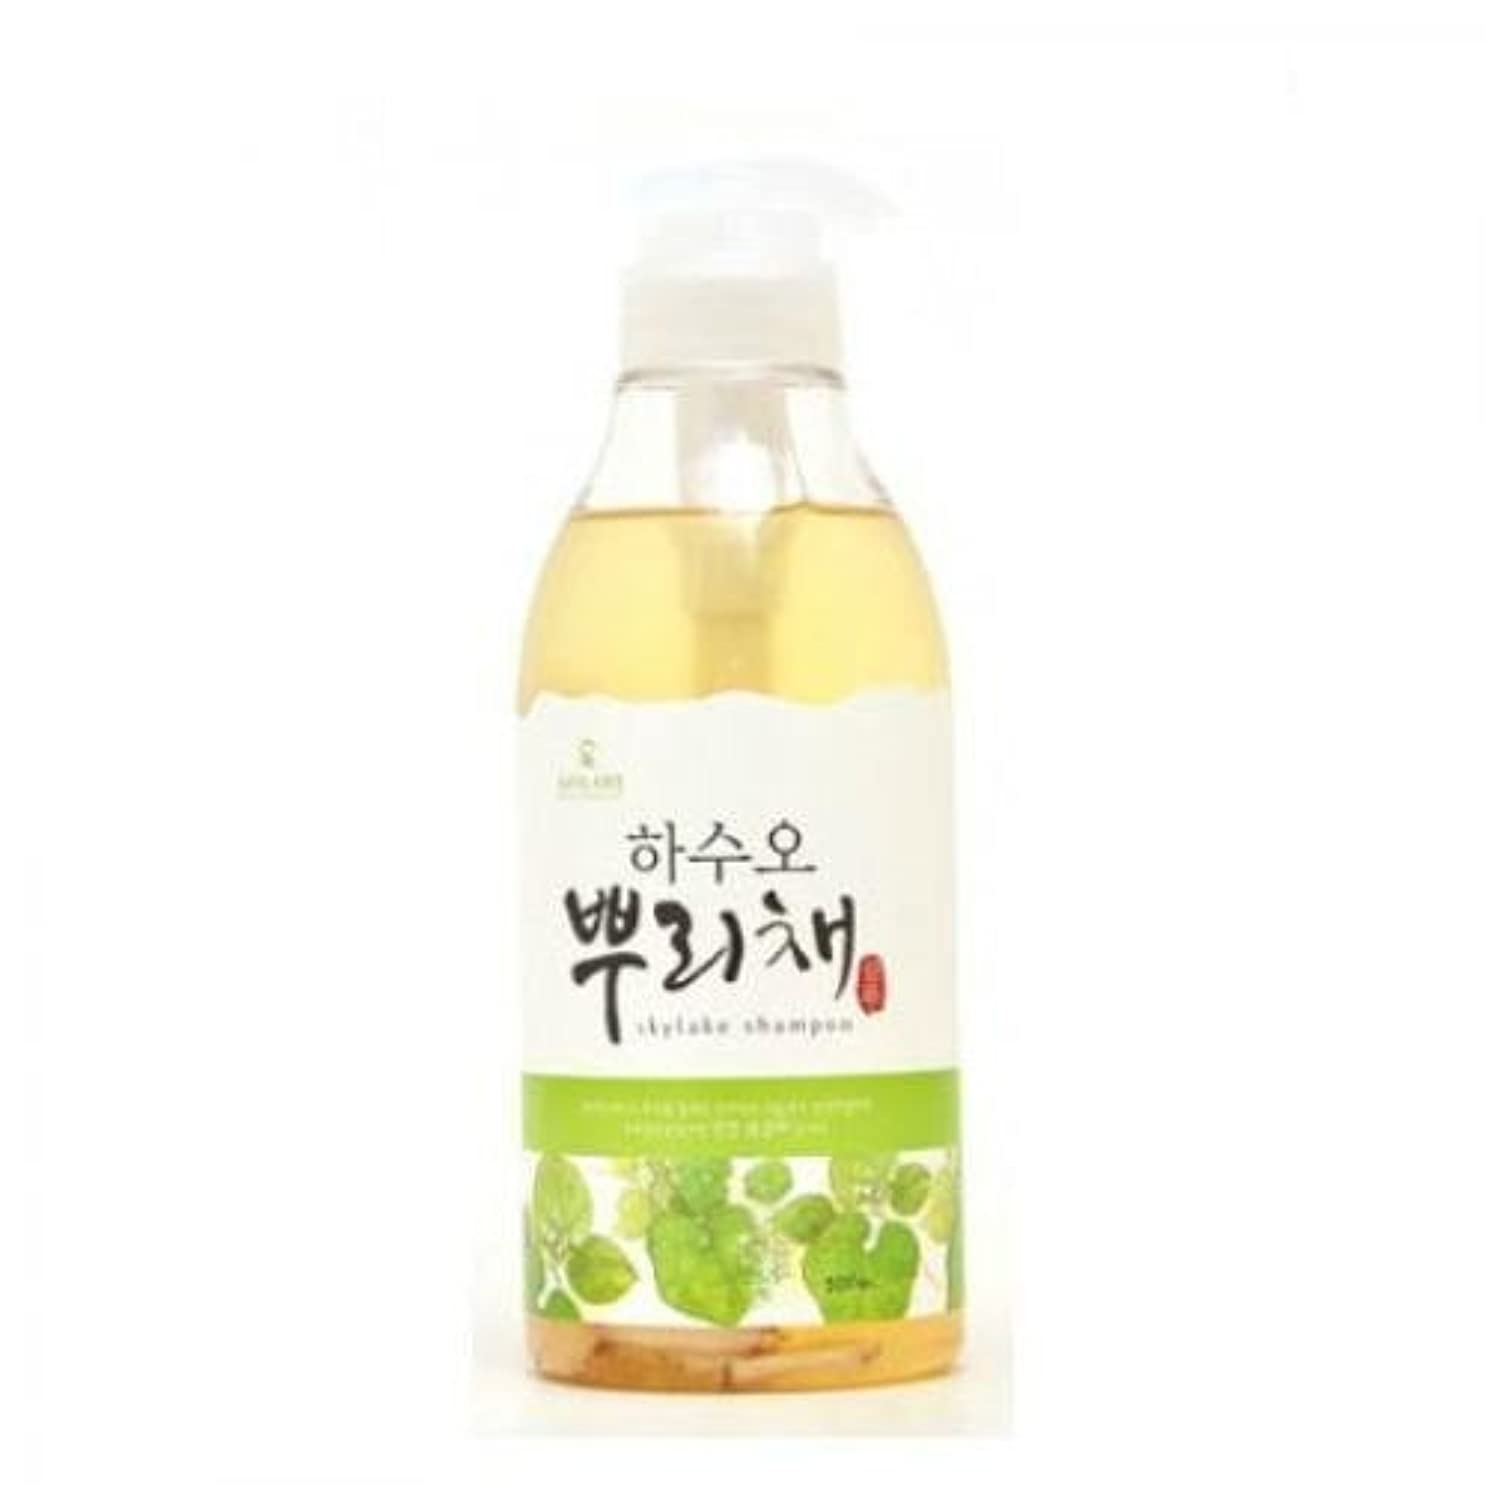 Skylake Oriental Herb Cool Shampoo (Korean original)